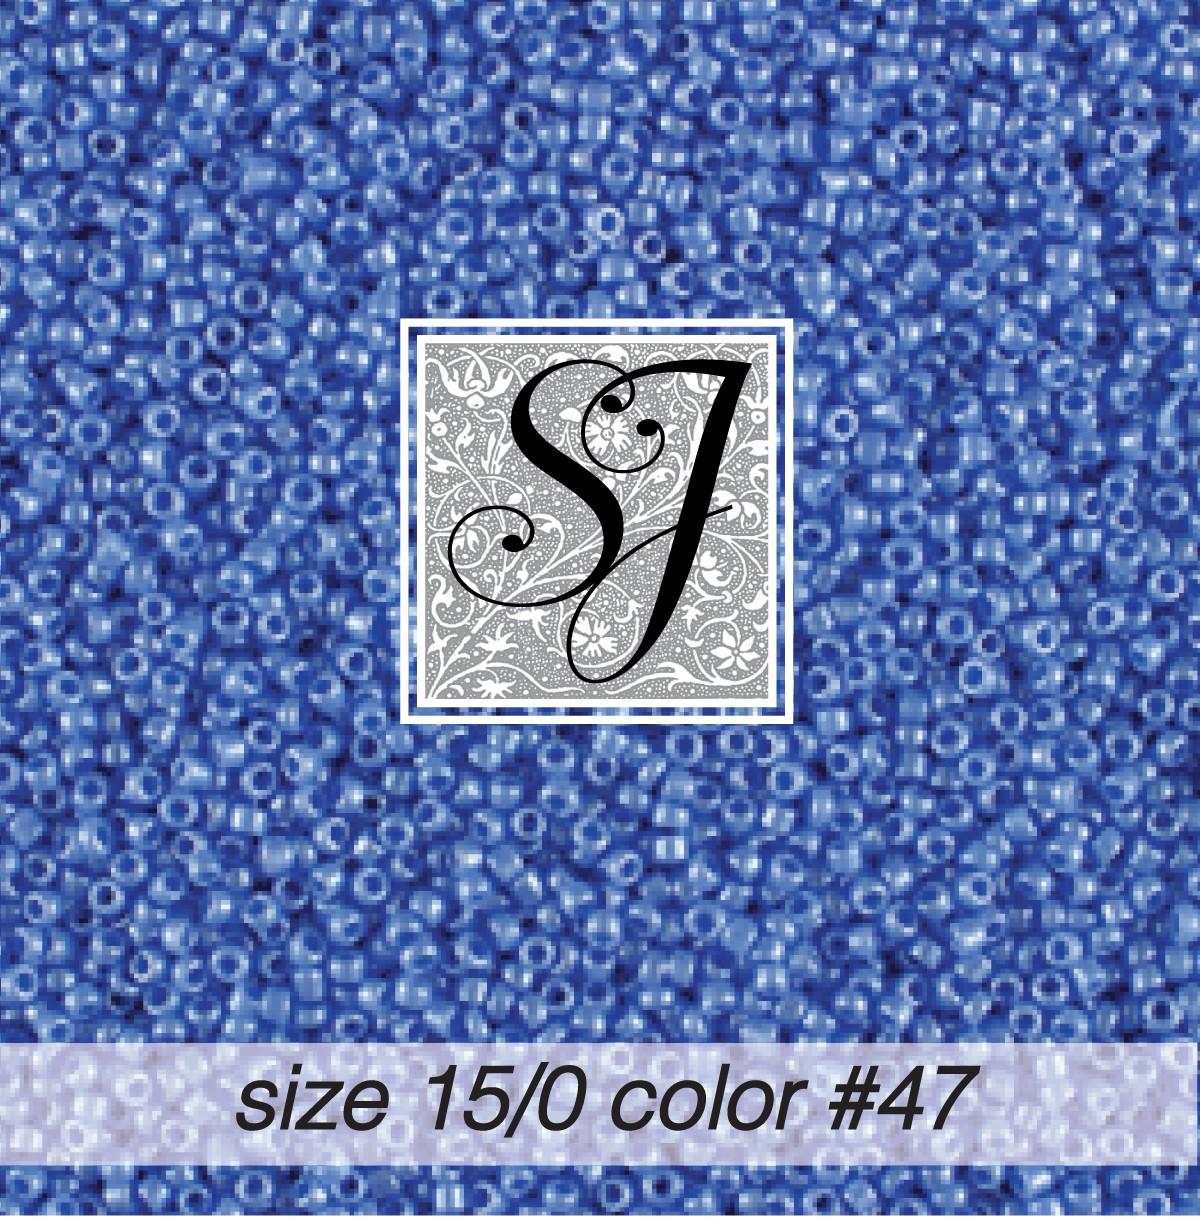 47 Light Periwinkle Pearl 15/0 Seed Bead